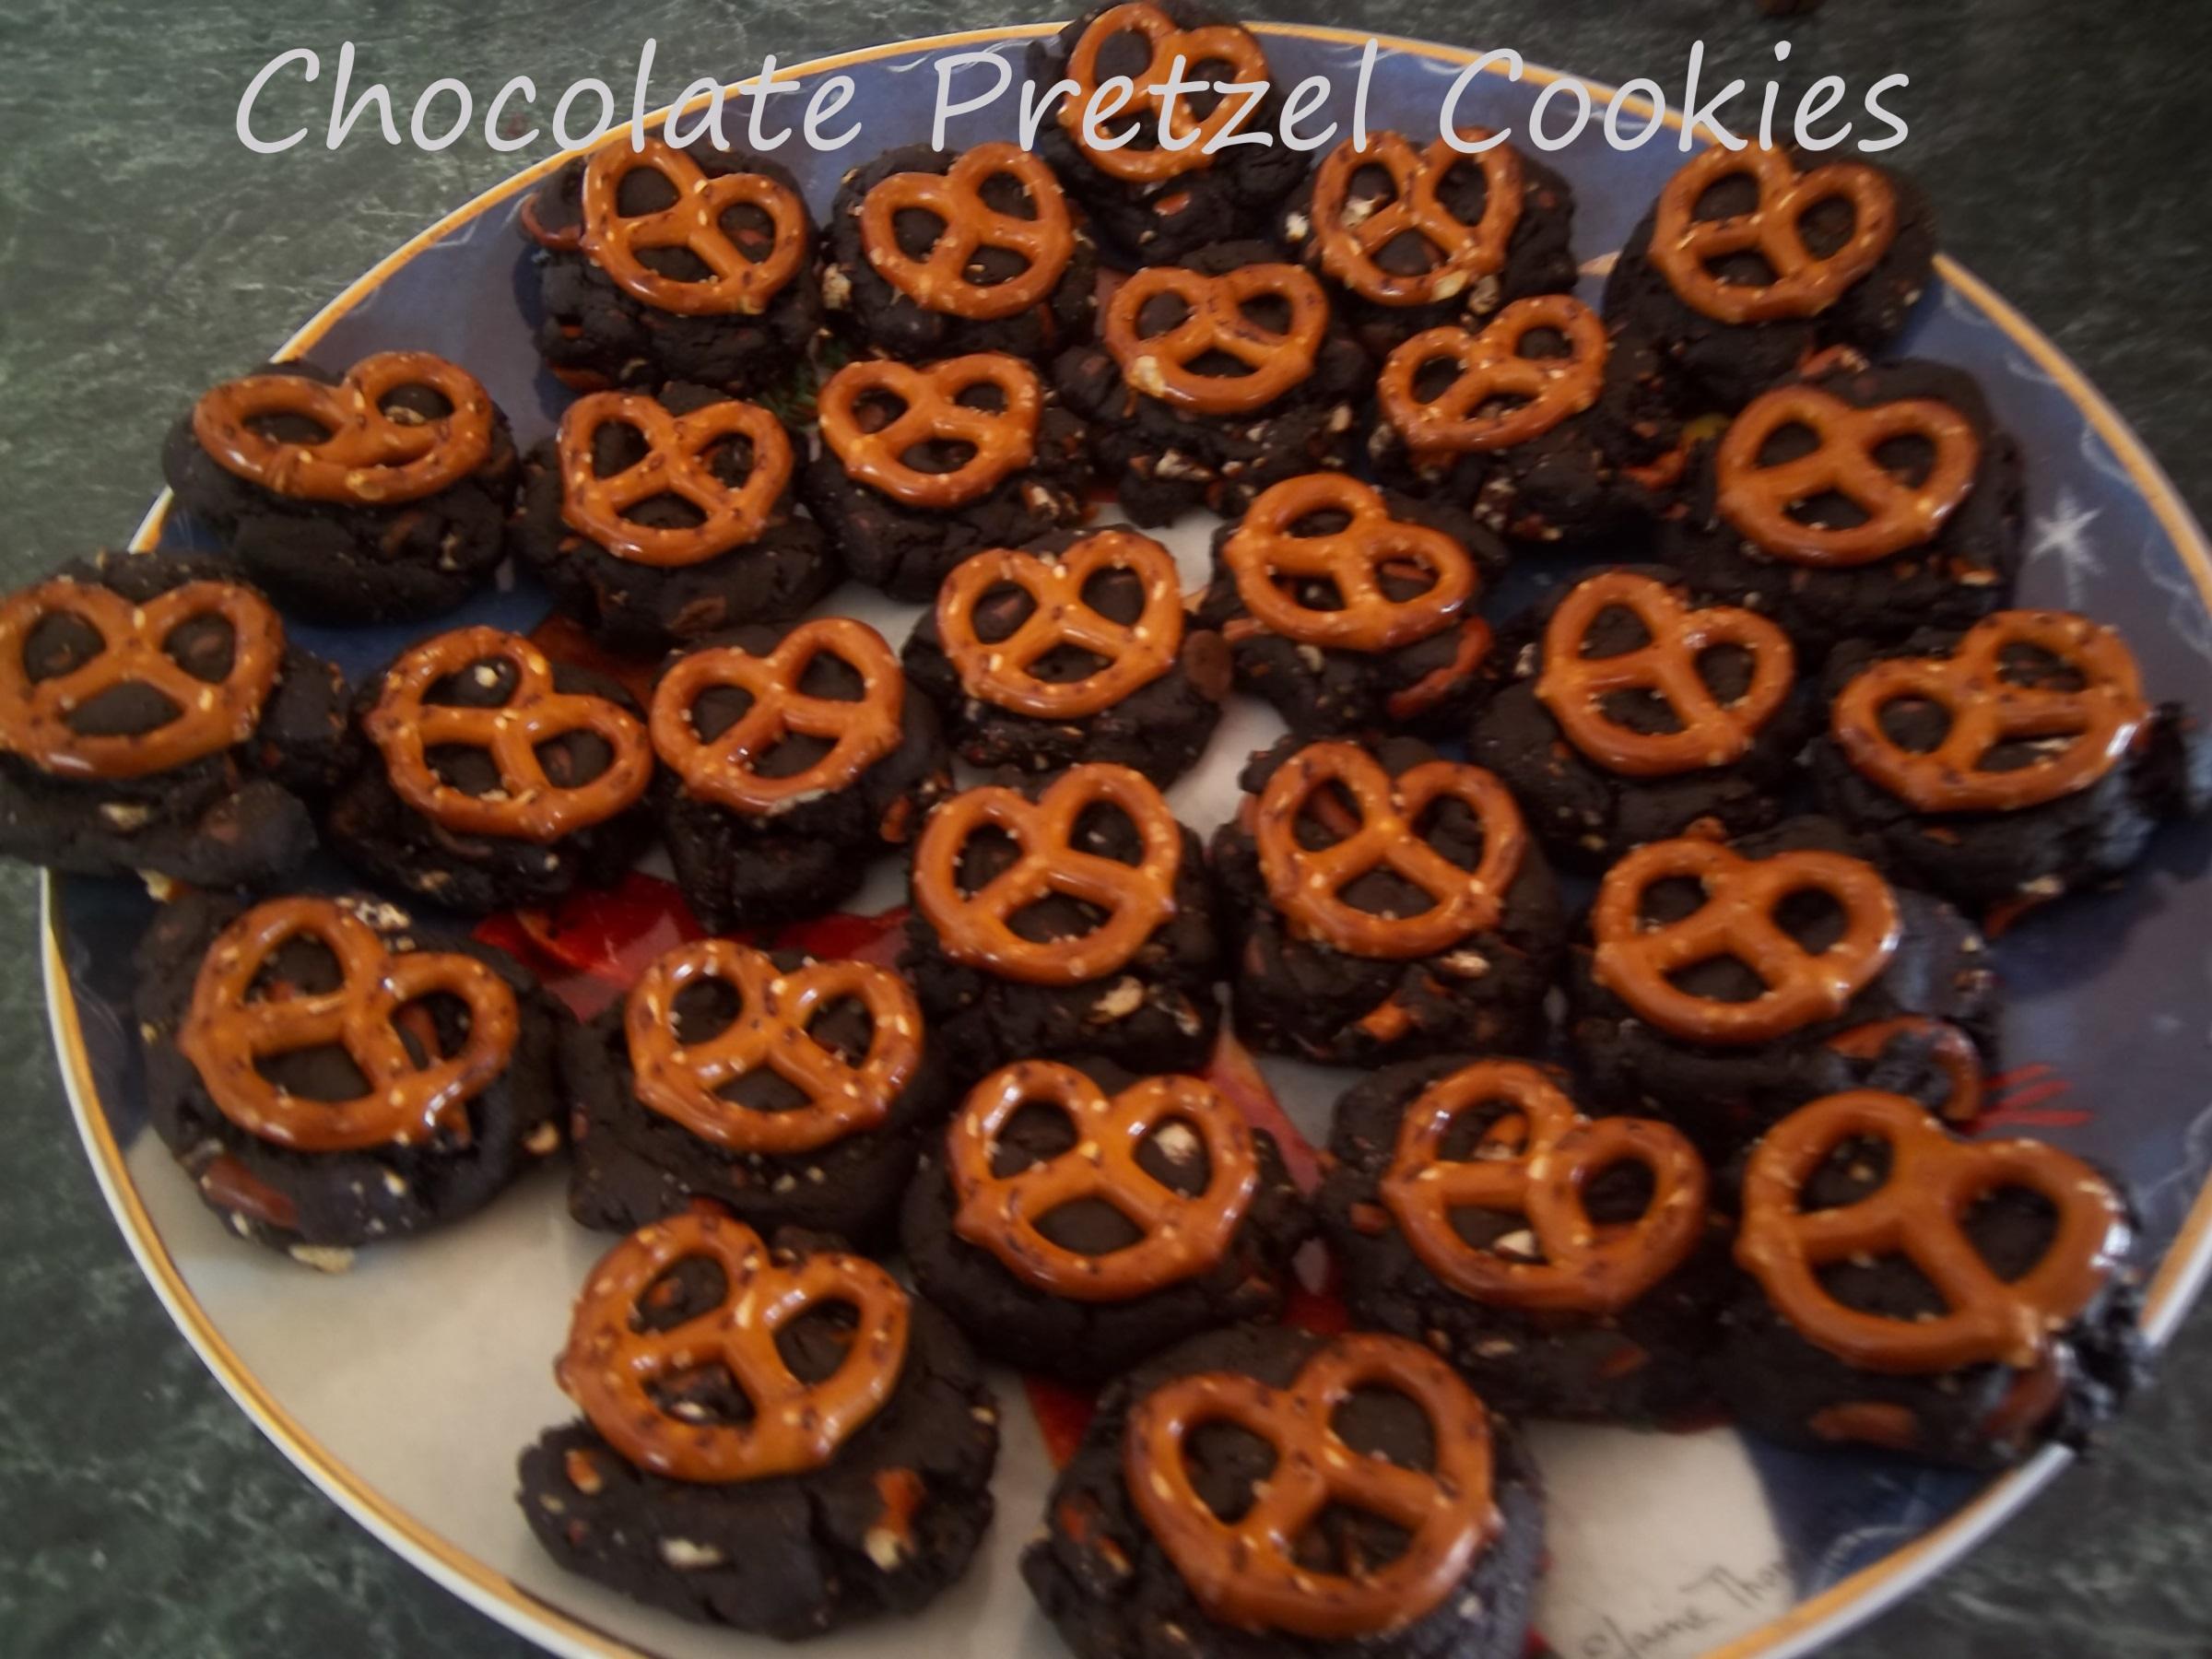 Chocolate Pretzel Cookies | Gluten Free Fabulous